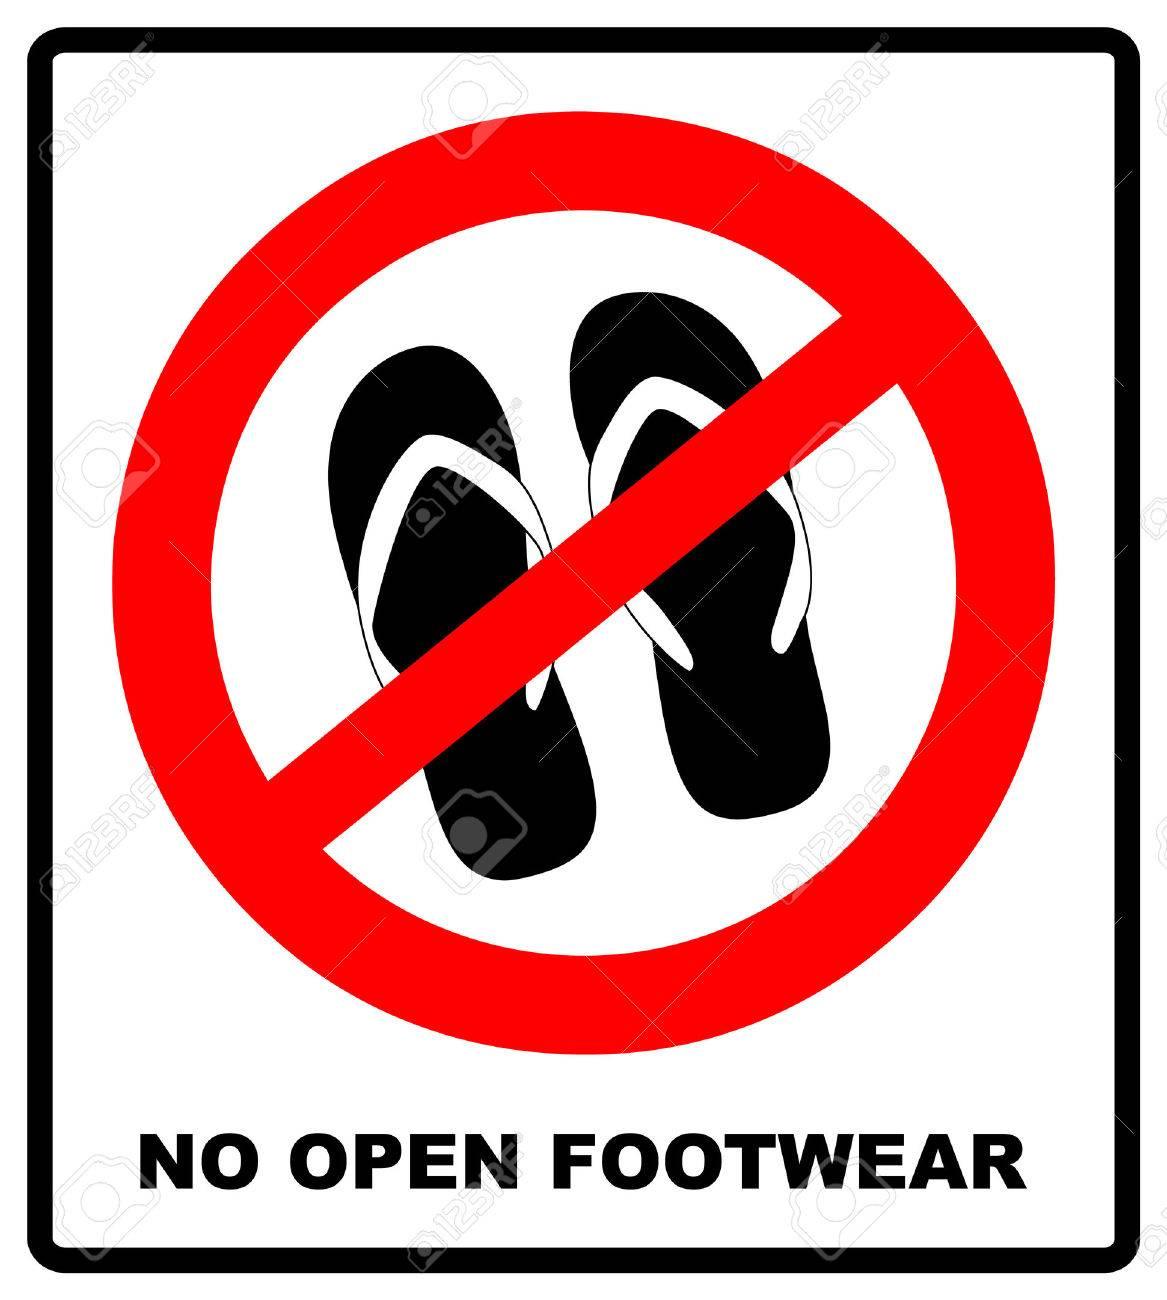 5a59ad81efef23 Vector - Warning banner of no sandals